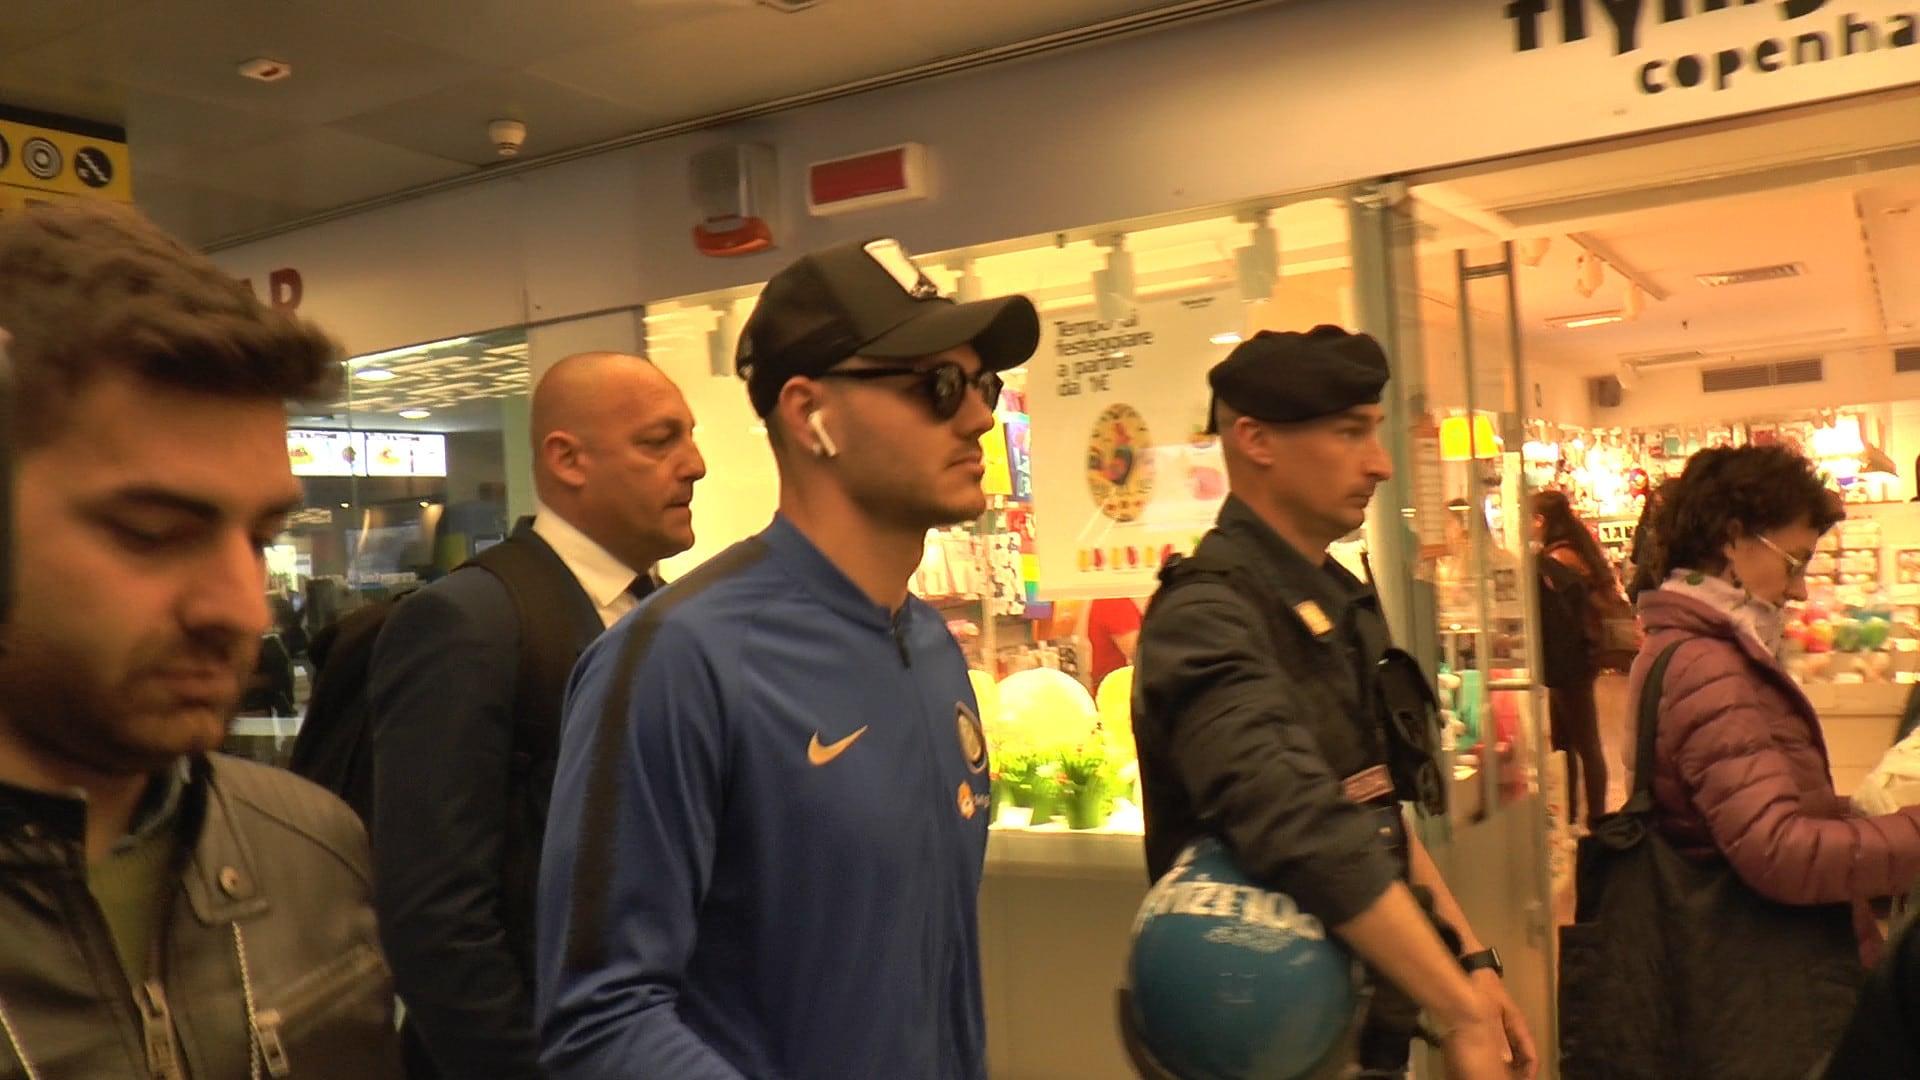 Inter, per Icardi servono 80 mln